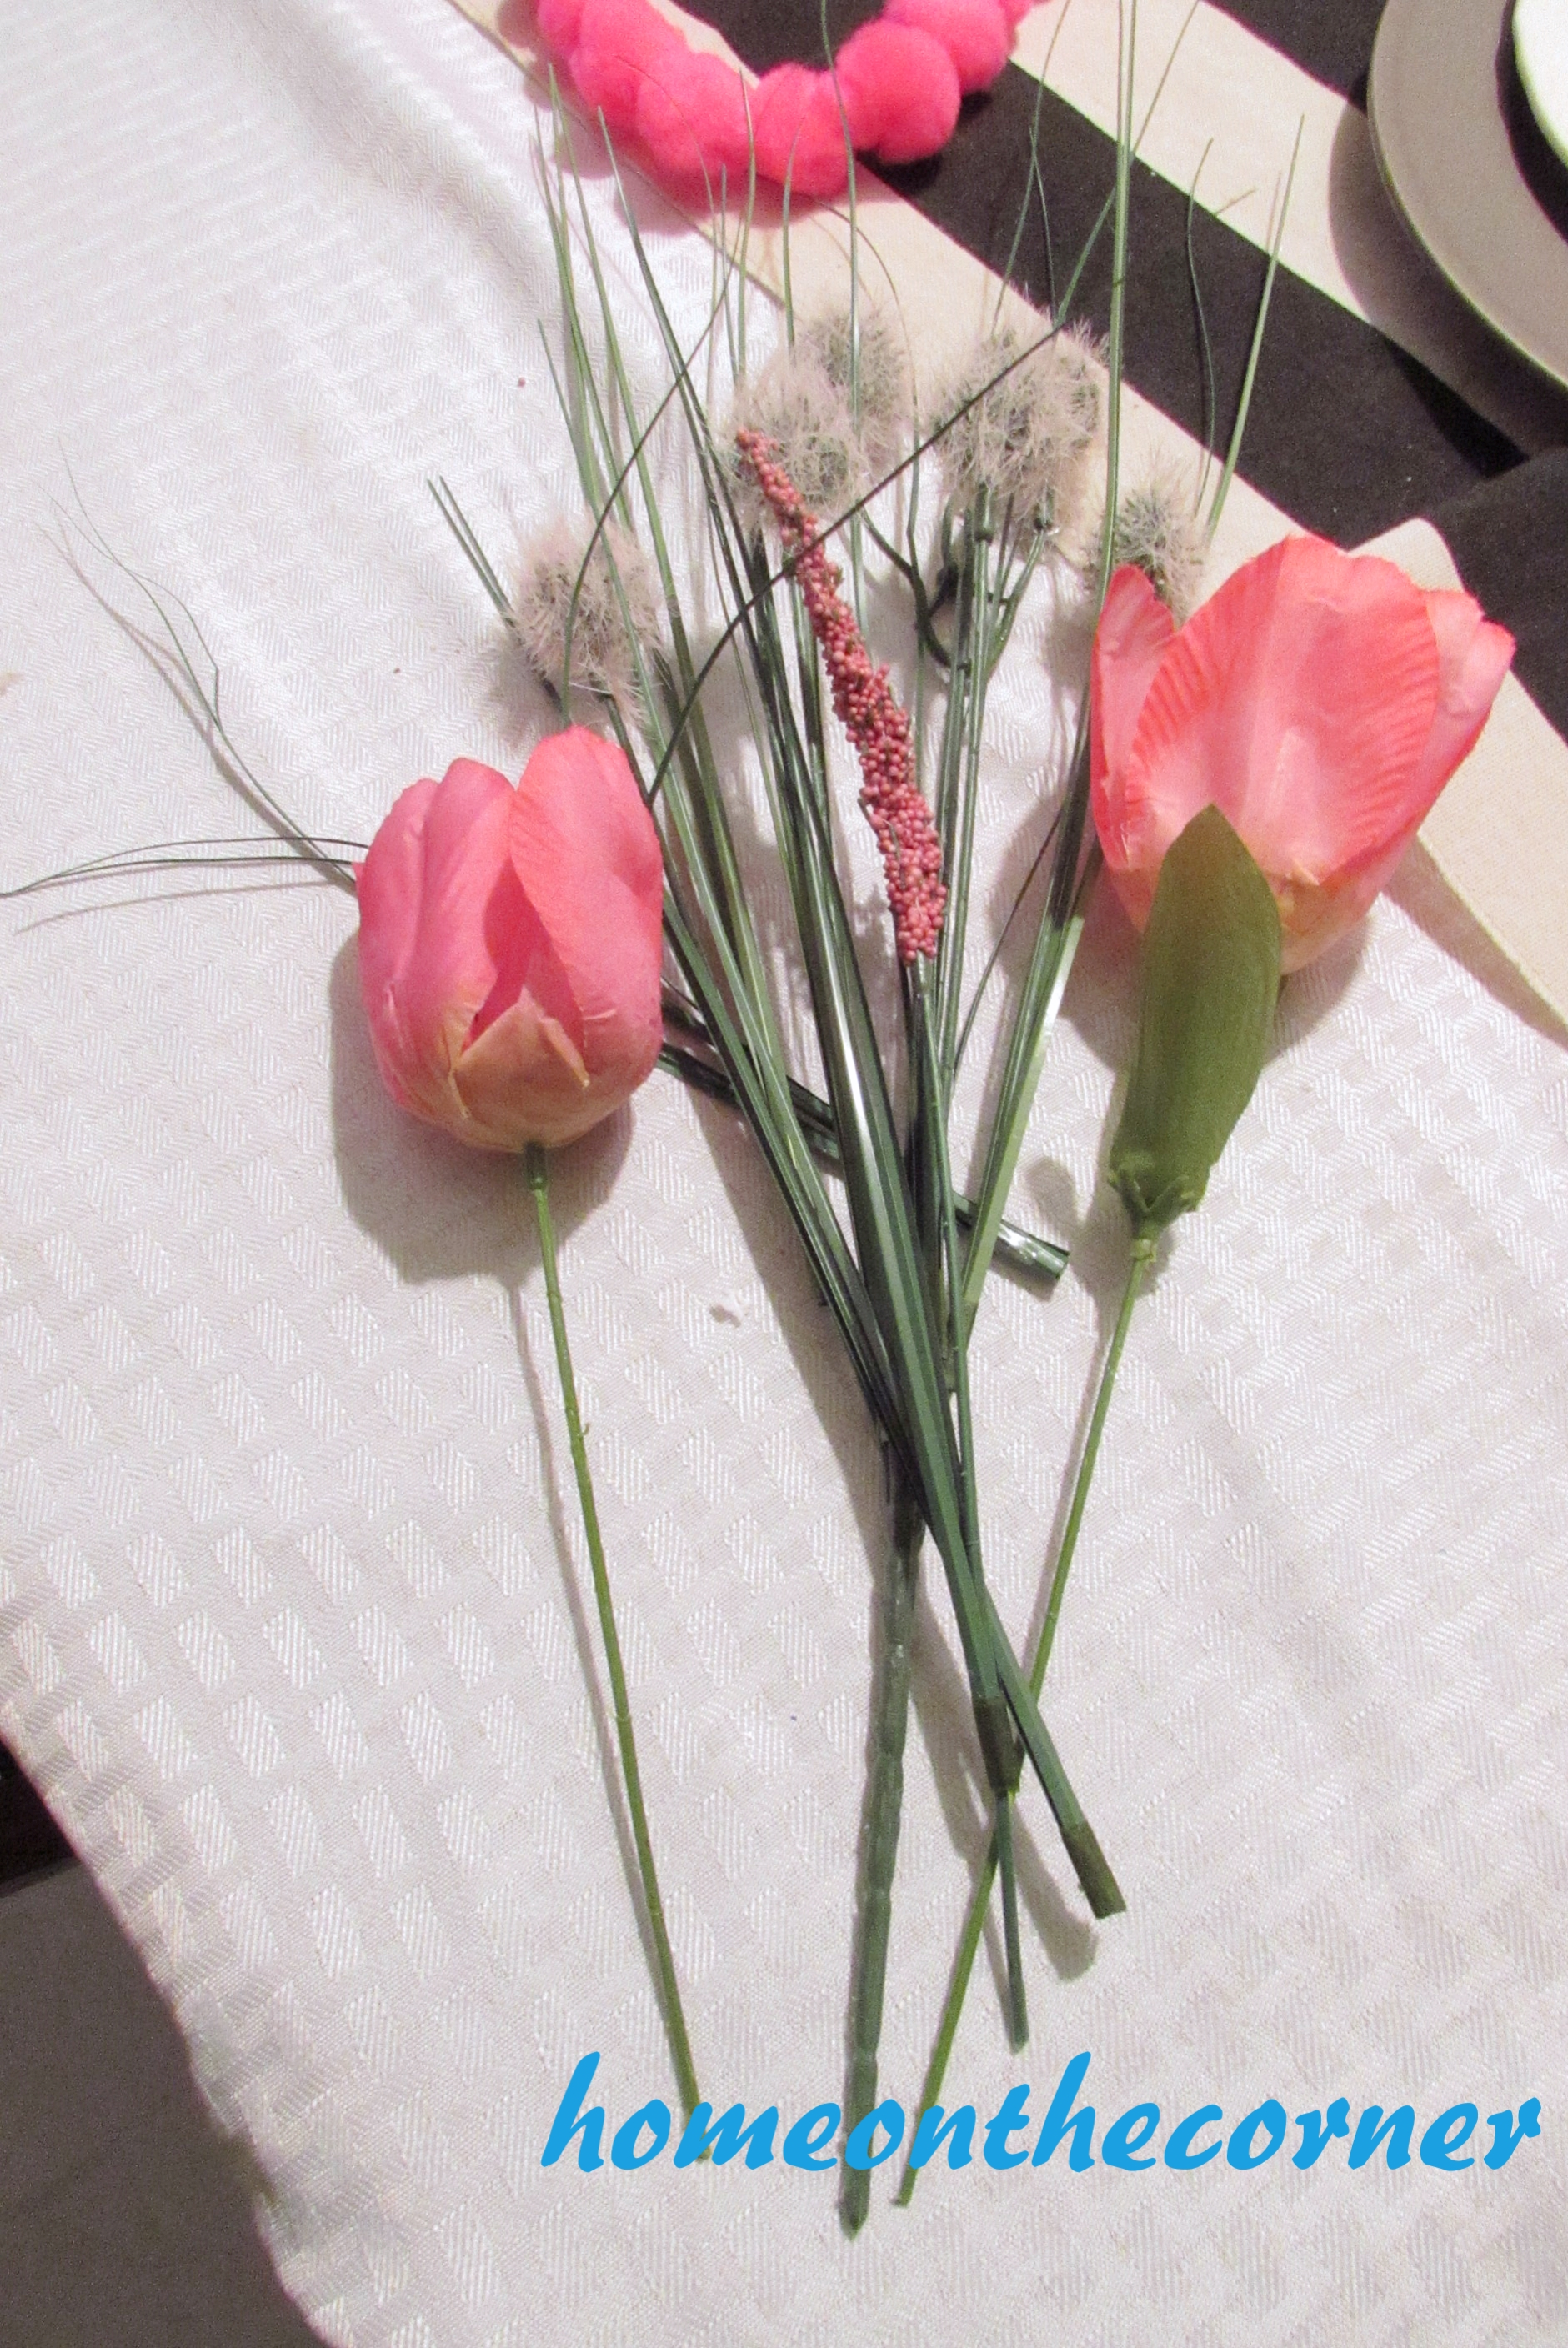 pixie stix flower fase silk flowers